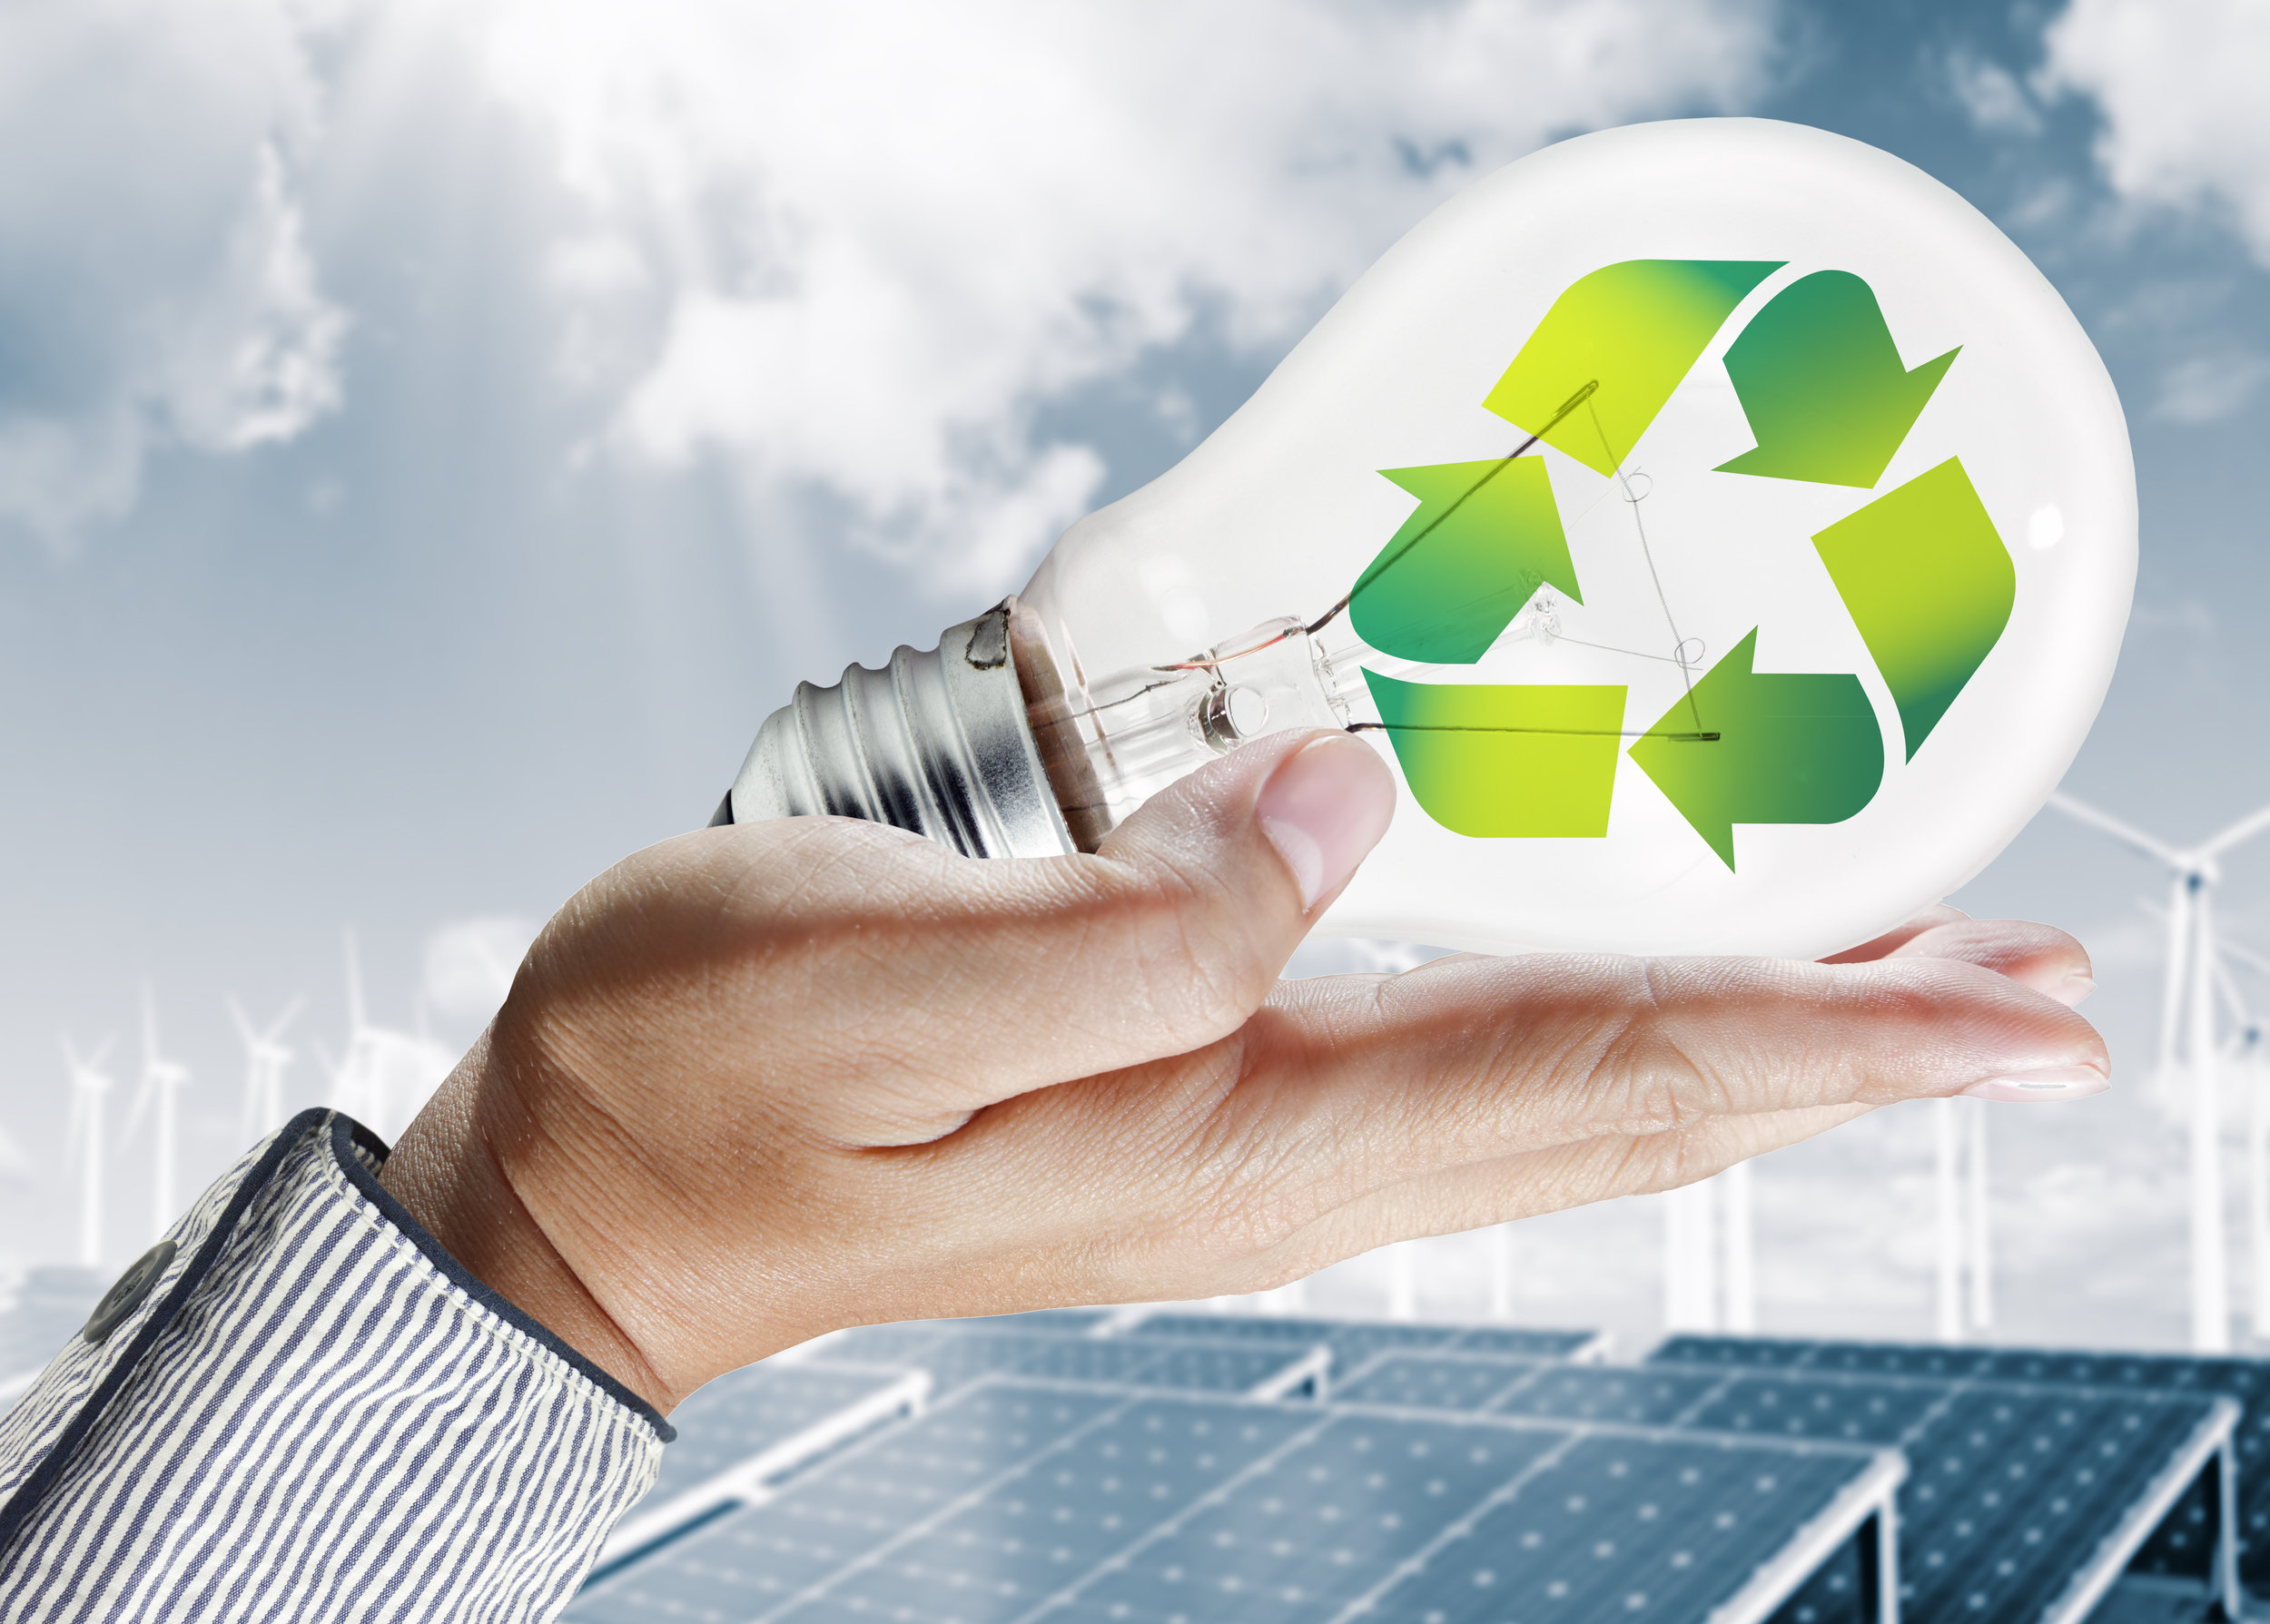 green-light-bulb-environment-concept_f11wS5Hu.jpg